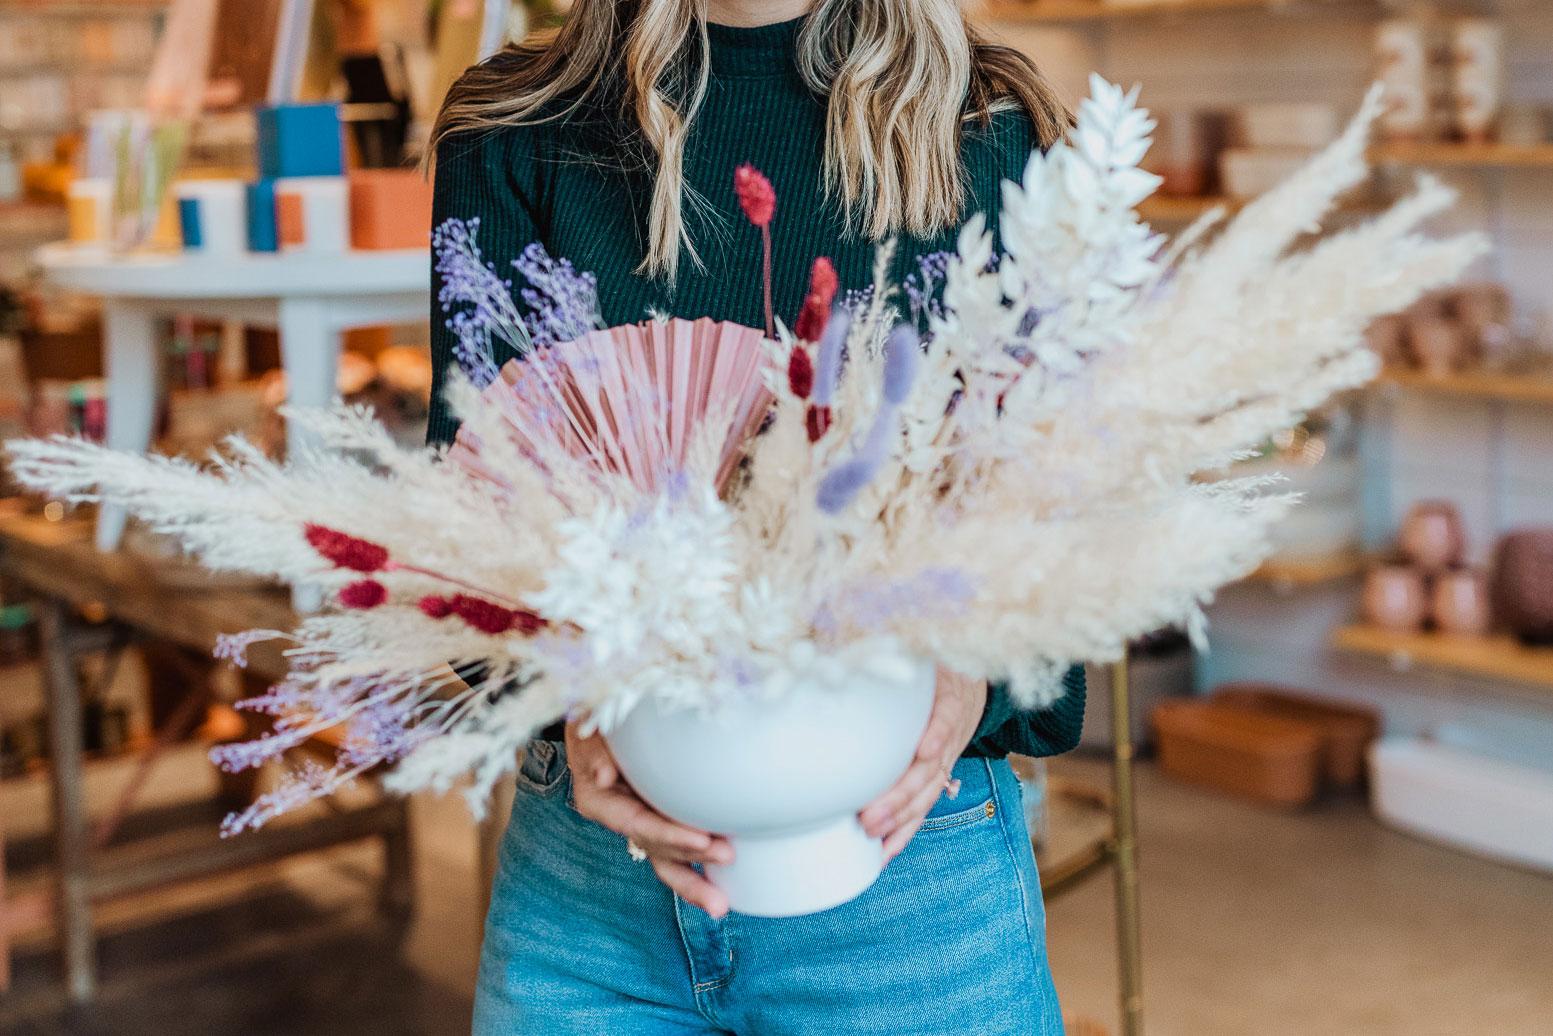 Woman holding vase.